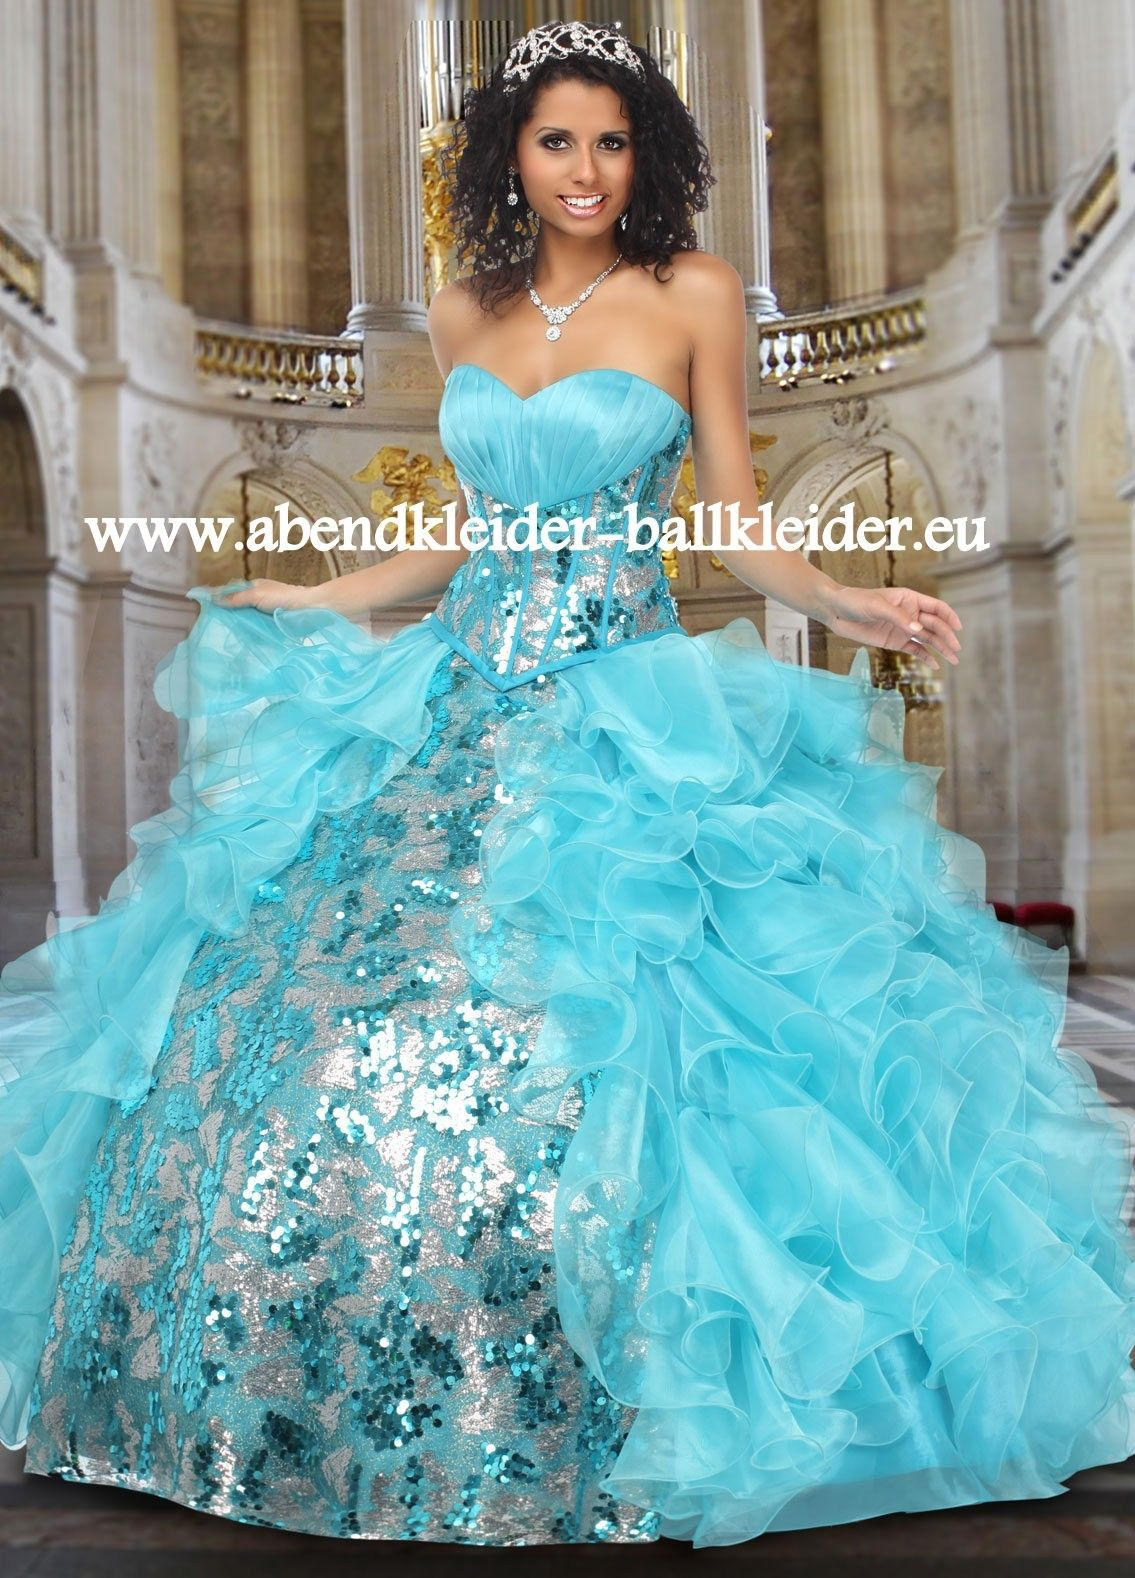 Metallic Look Abendkleid ballkleid Brautkleid in Hell Blau | Kleider ...